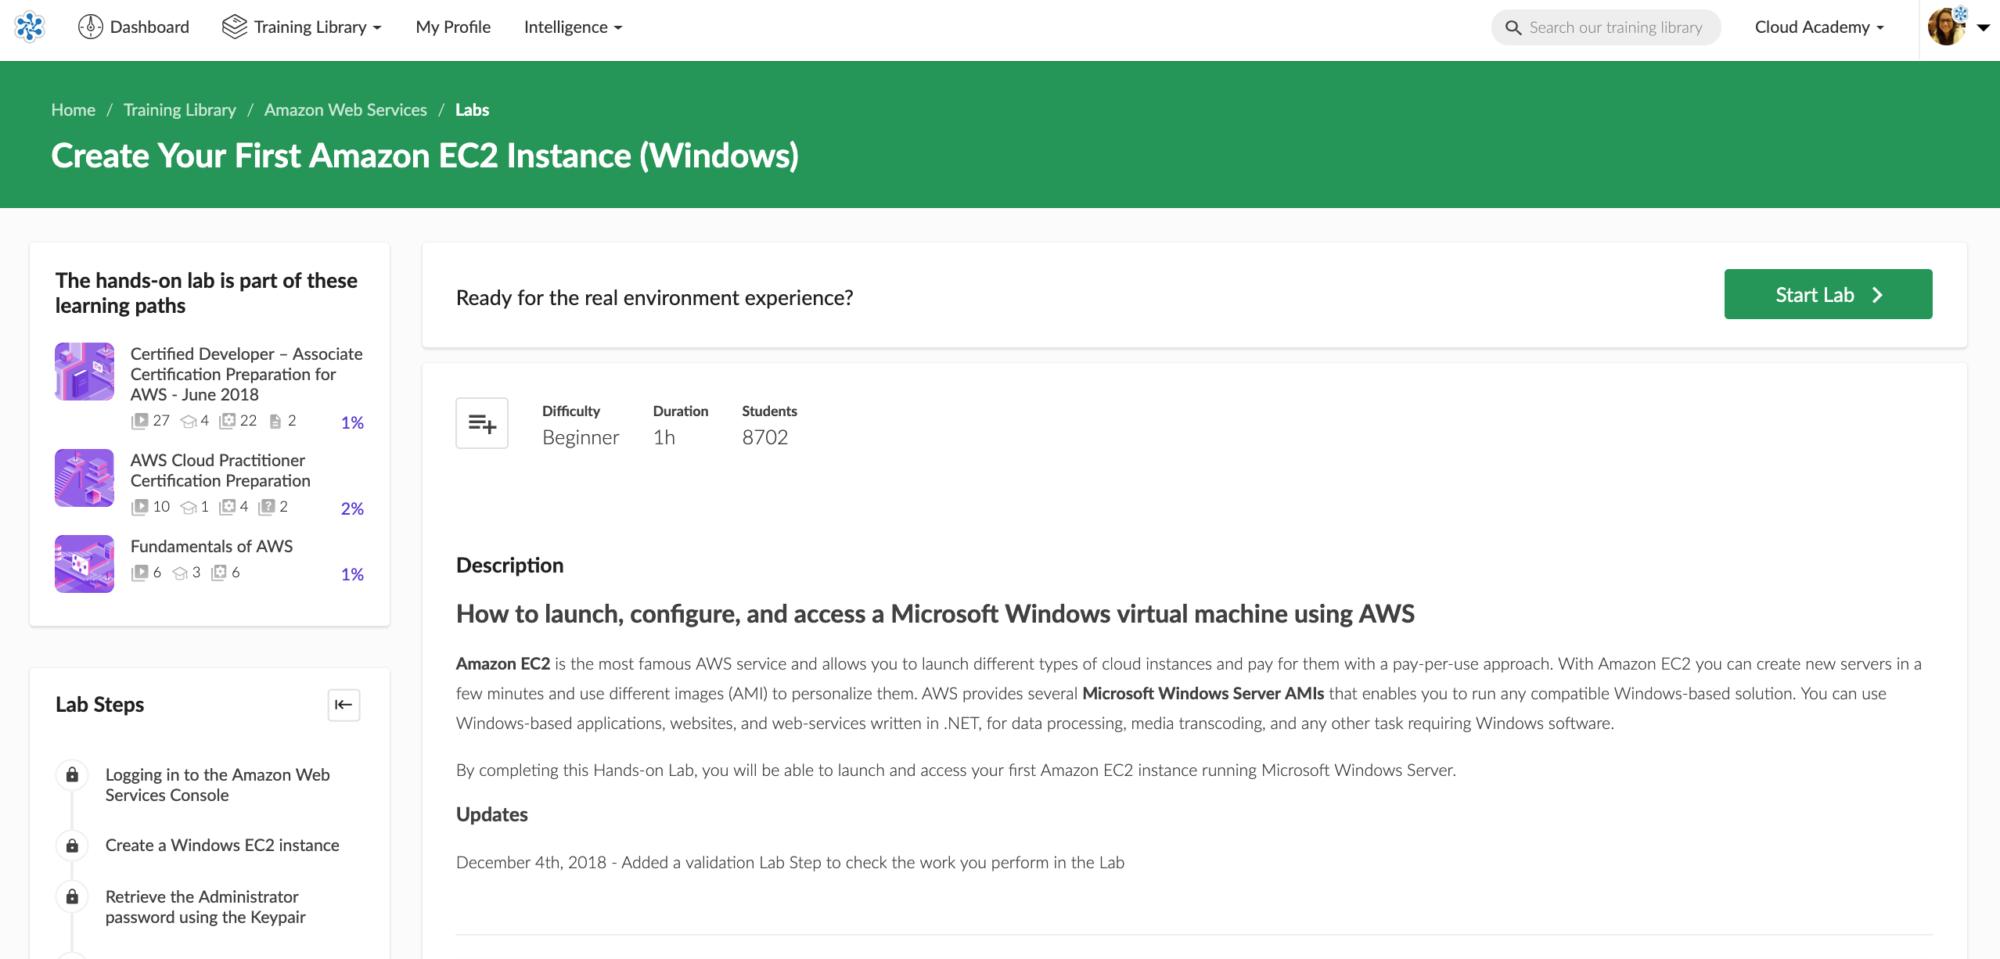 Create Your First Amazon EC2 Instance (Windows) Lab